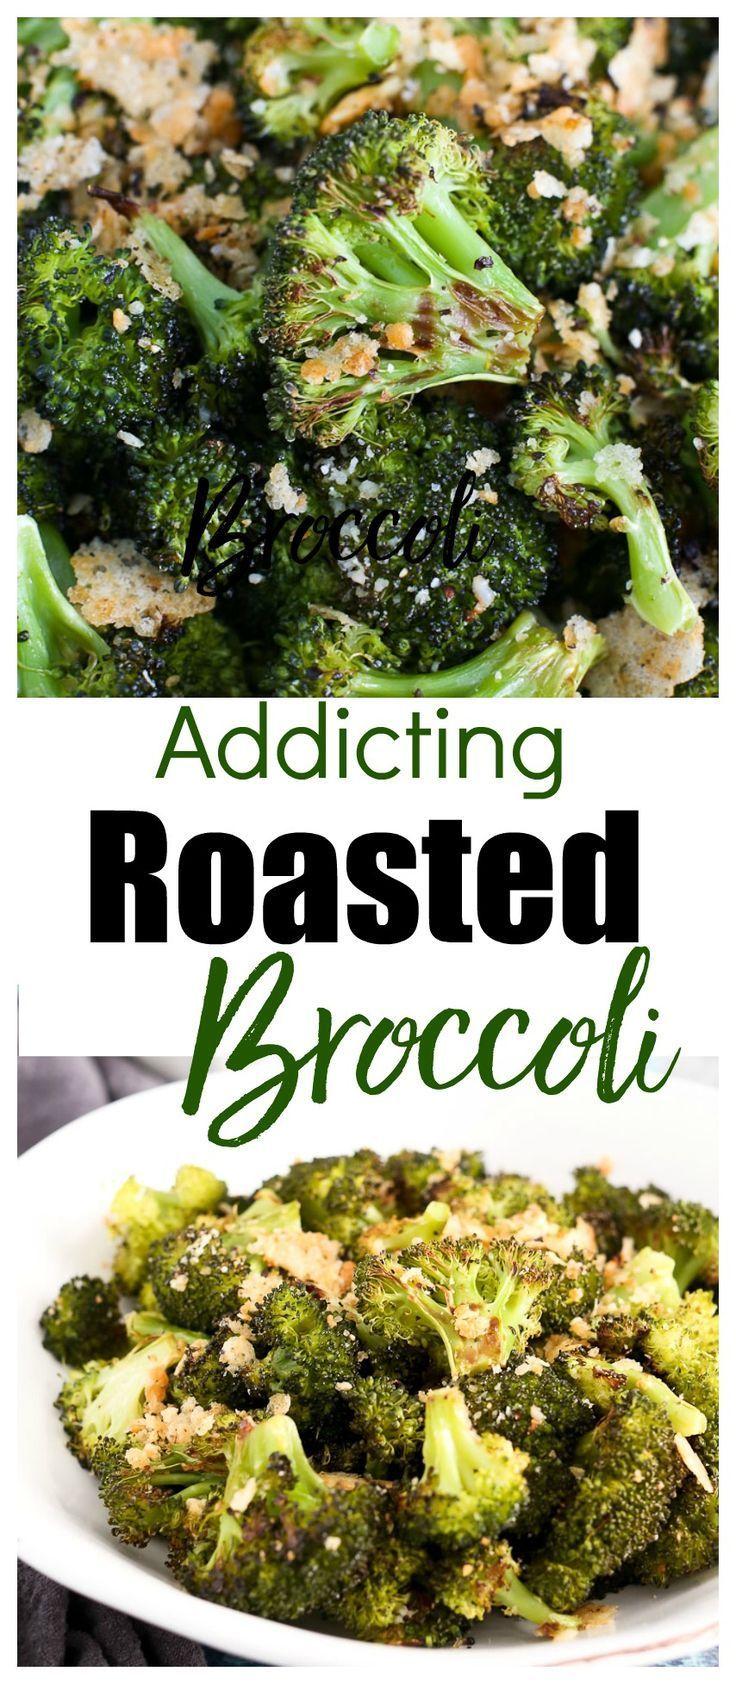 Roasted Broccoli with Parmesan Recipe #healthy #vegetable #glutenfree #sidedish via @Maryea Flaherty #vegetablerecipes